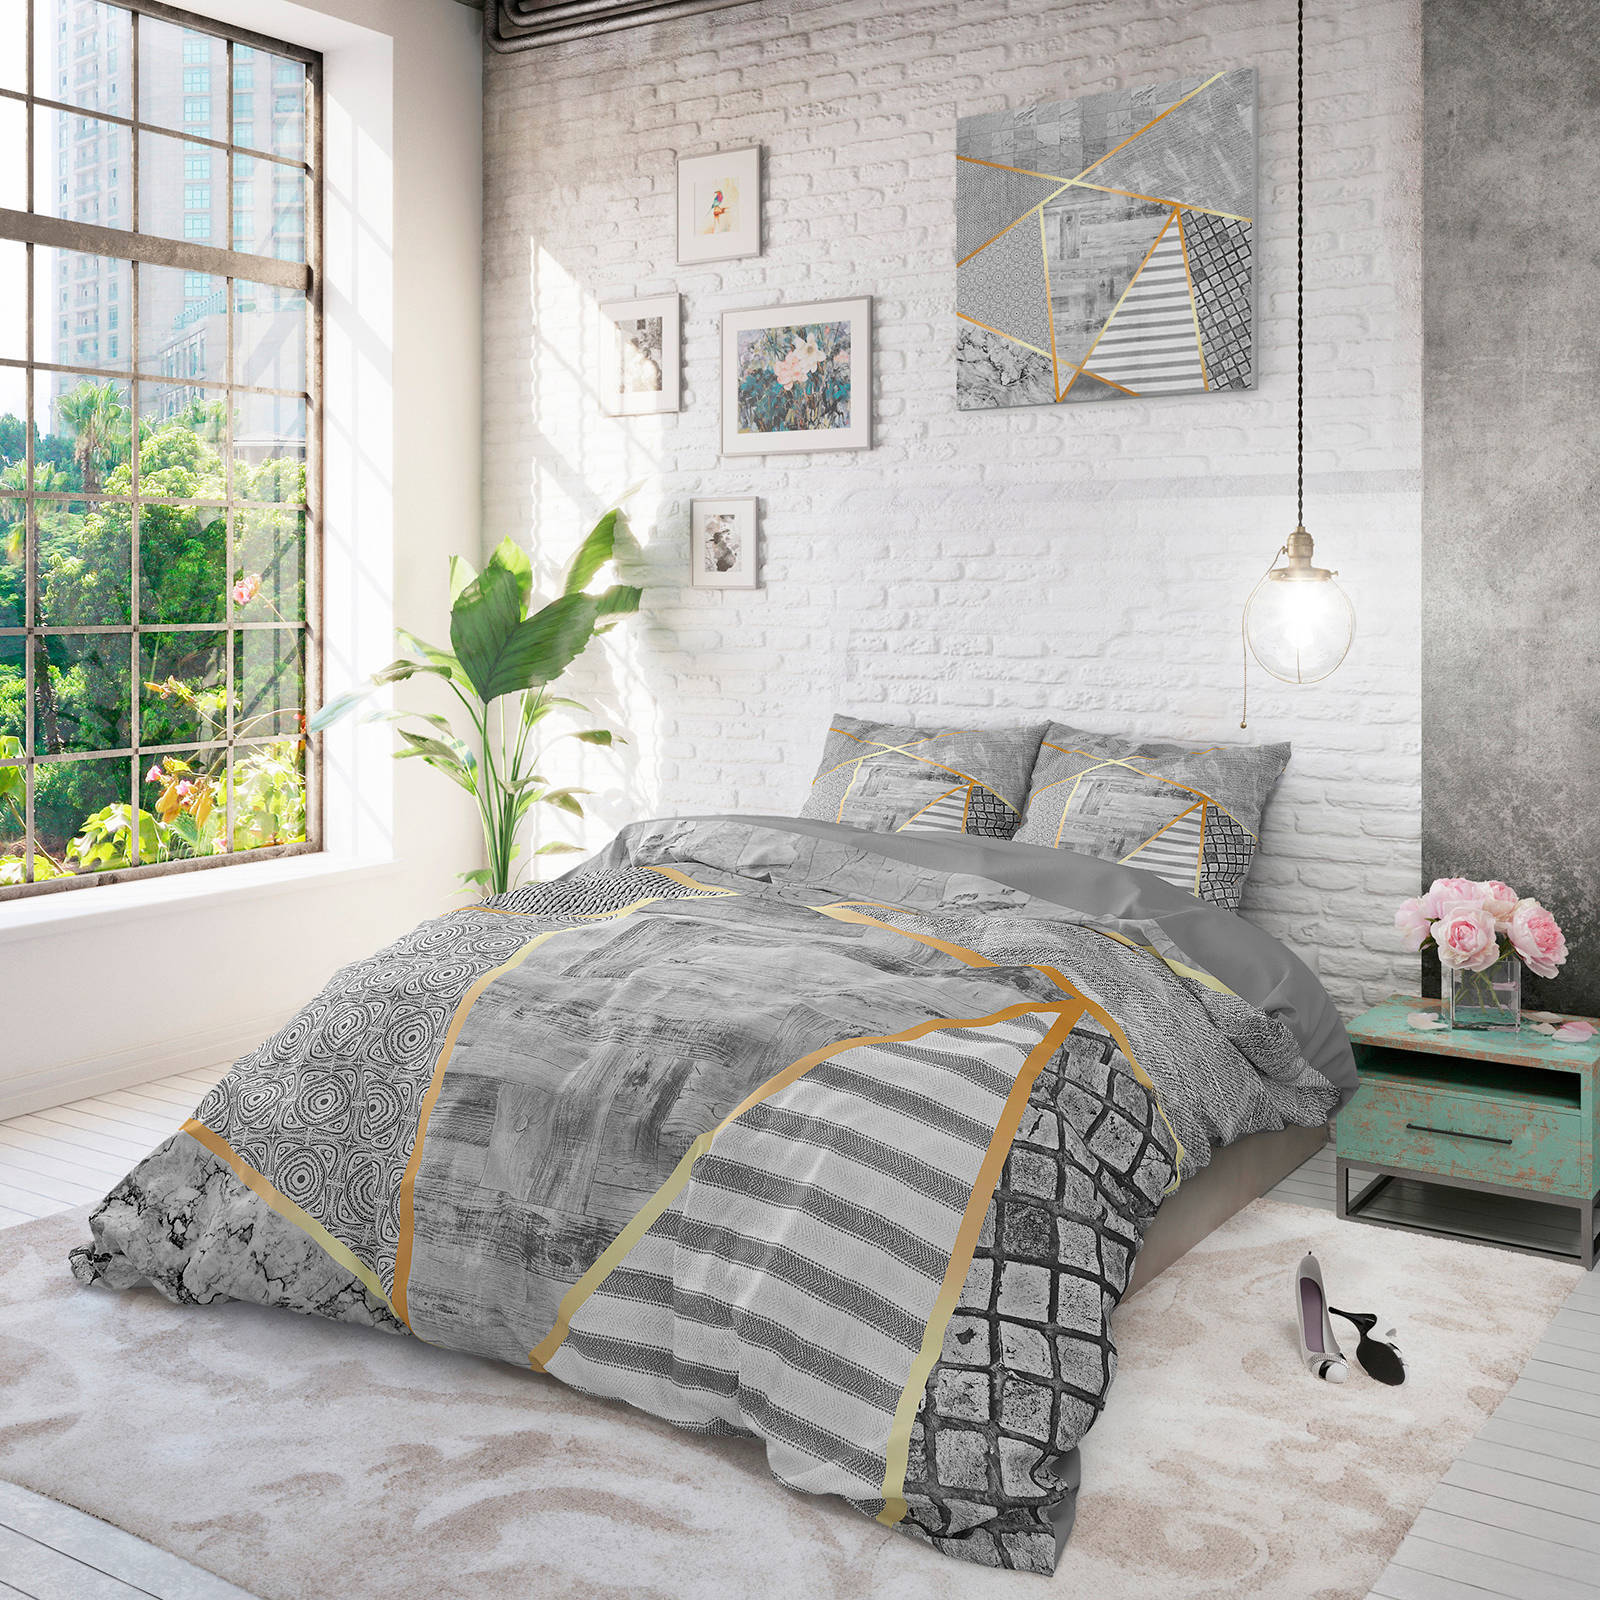 dreamhouse katoenen dekbedovertrek lits jumeaux grijs